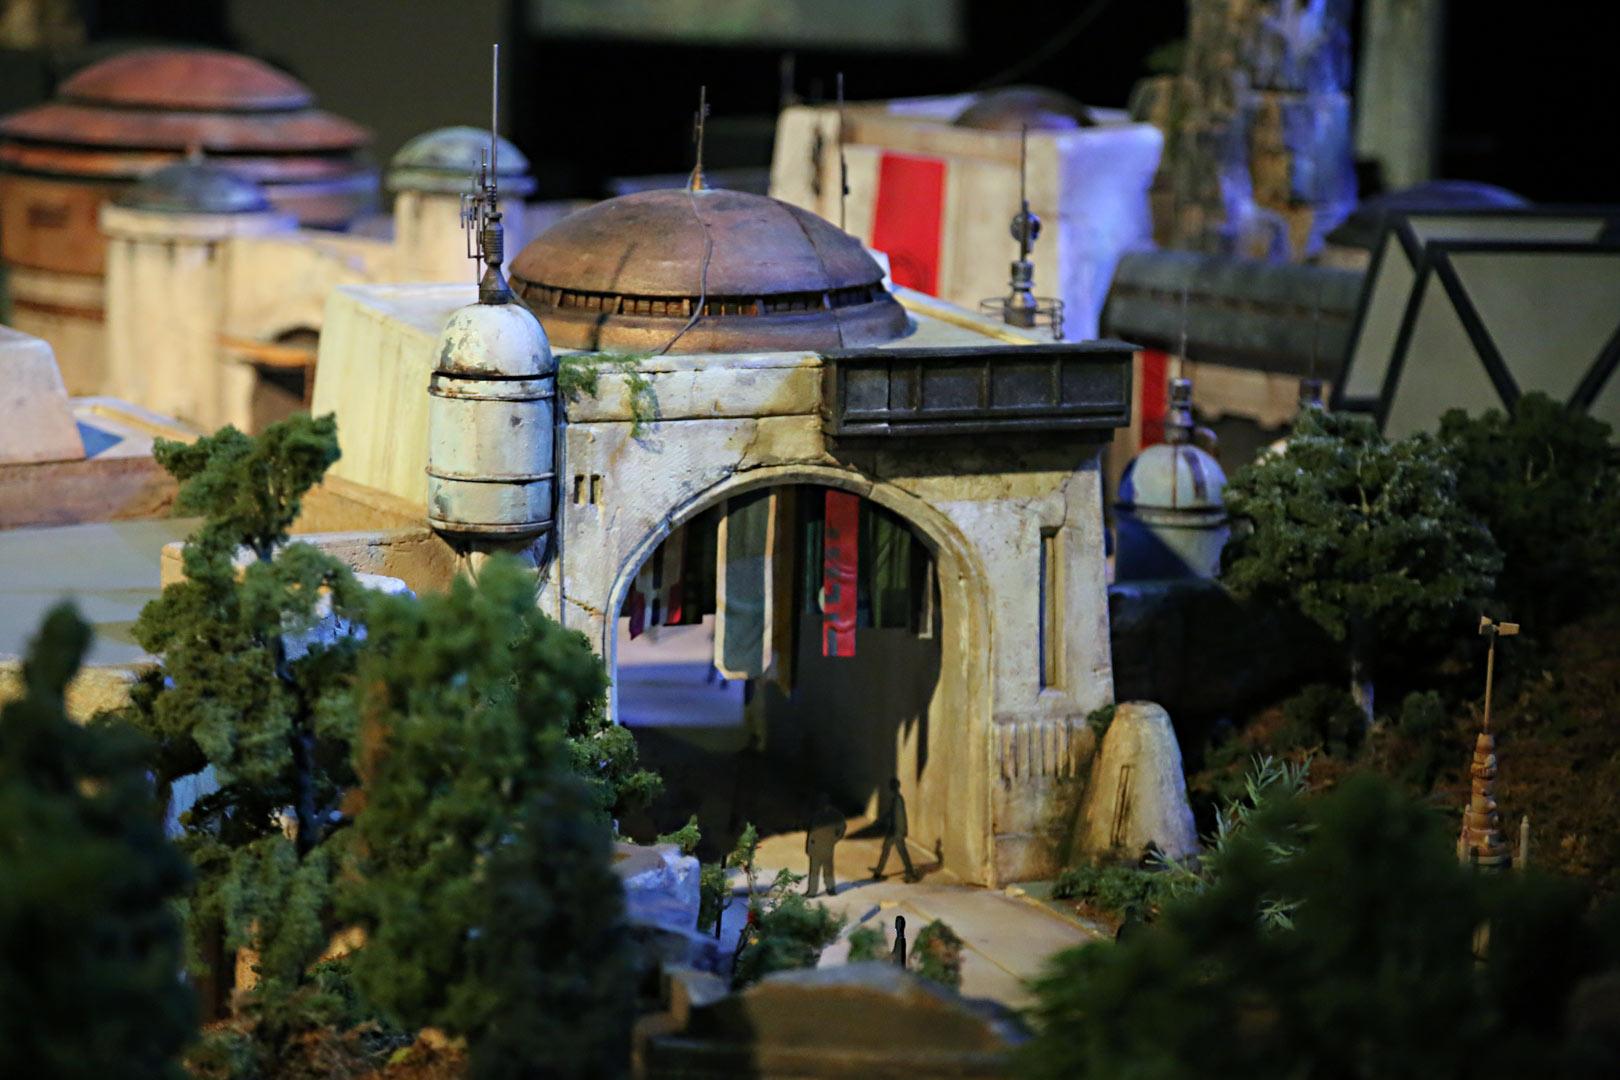 Новости Звездных Войн (Star Wars news): STAR WARS land model at D23: image gallery